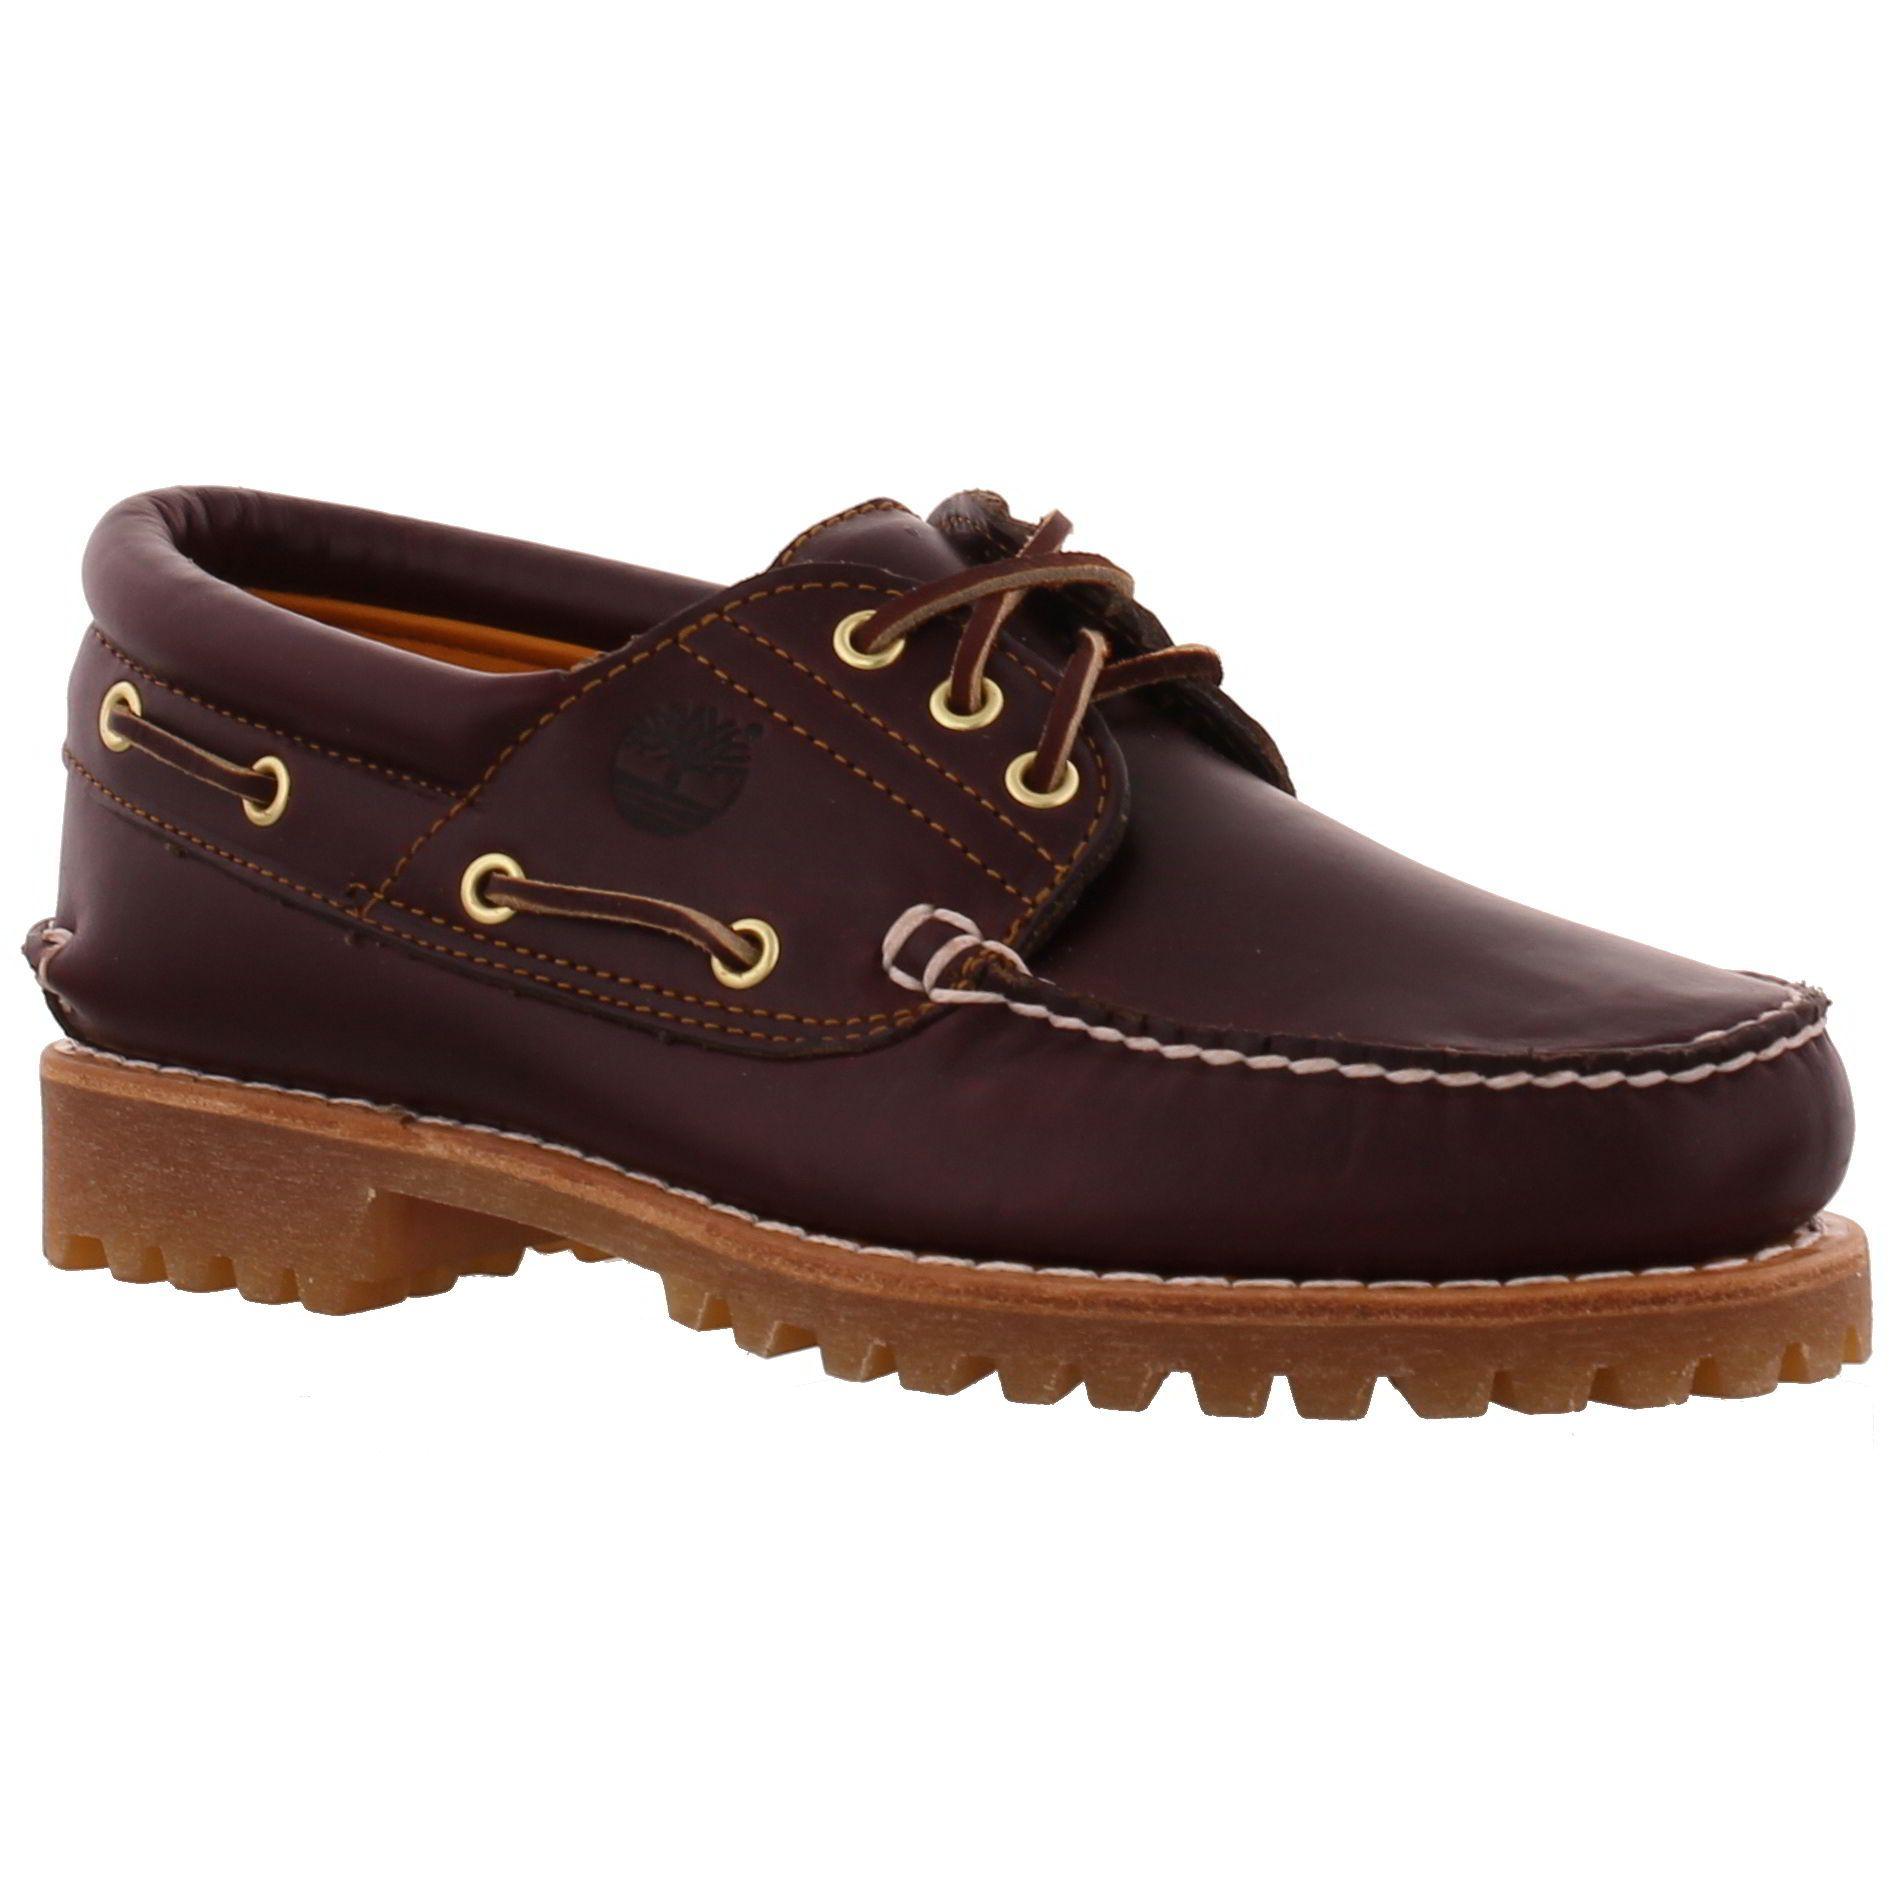 Timberland Mens Heritage Boat Shoes Burgundy | Vêtements